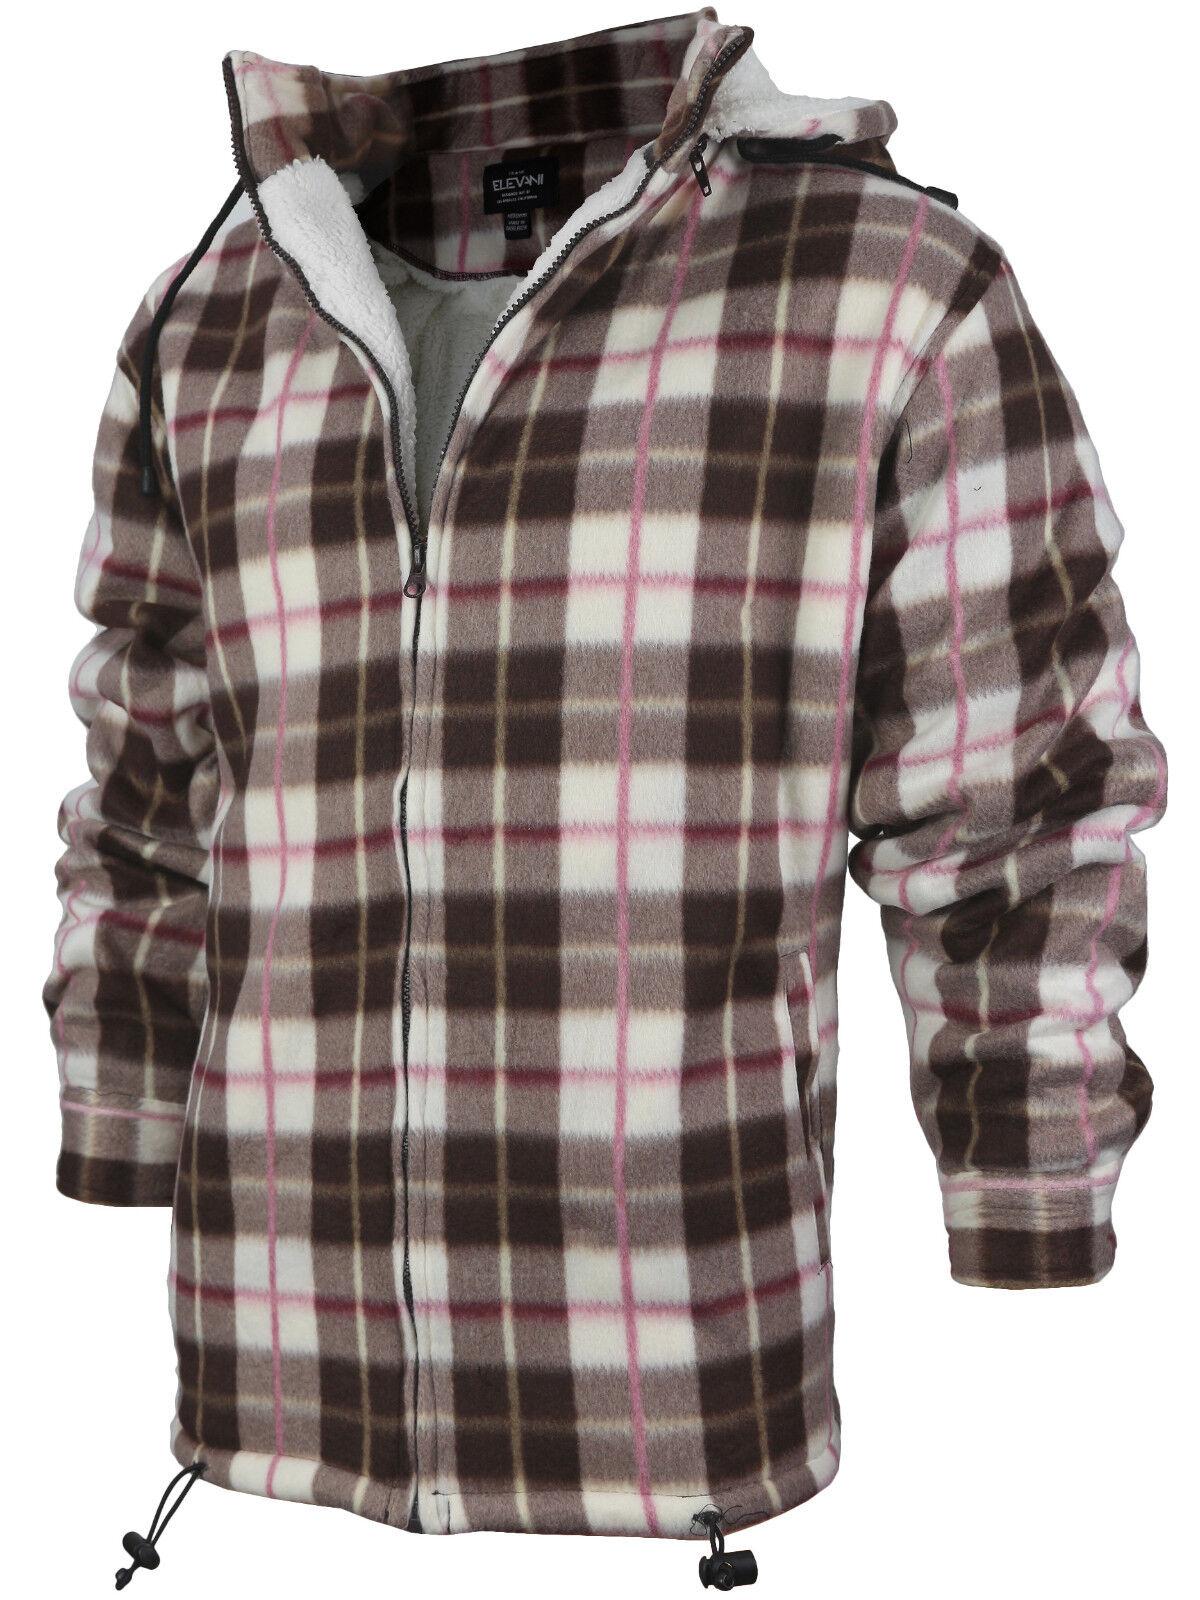 Men's Heavy Fleece Lined Sherpa Hoodie Plaid Flannel Jacket With Hood P17 - Brown Cream Red